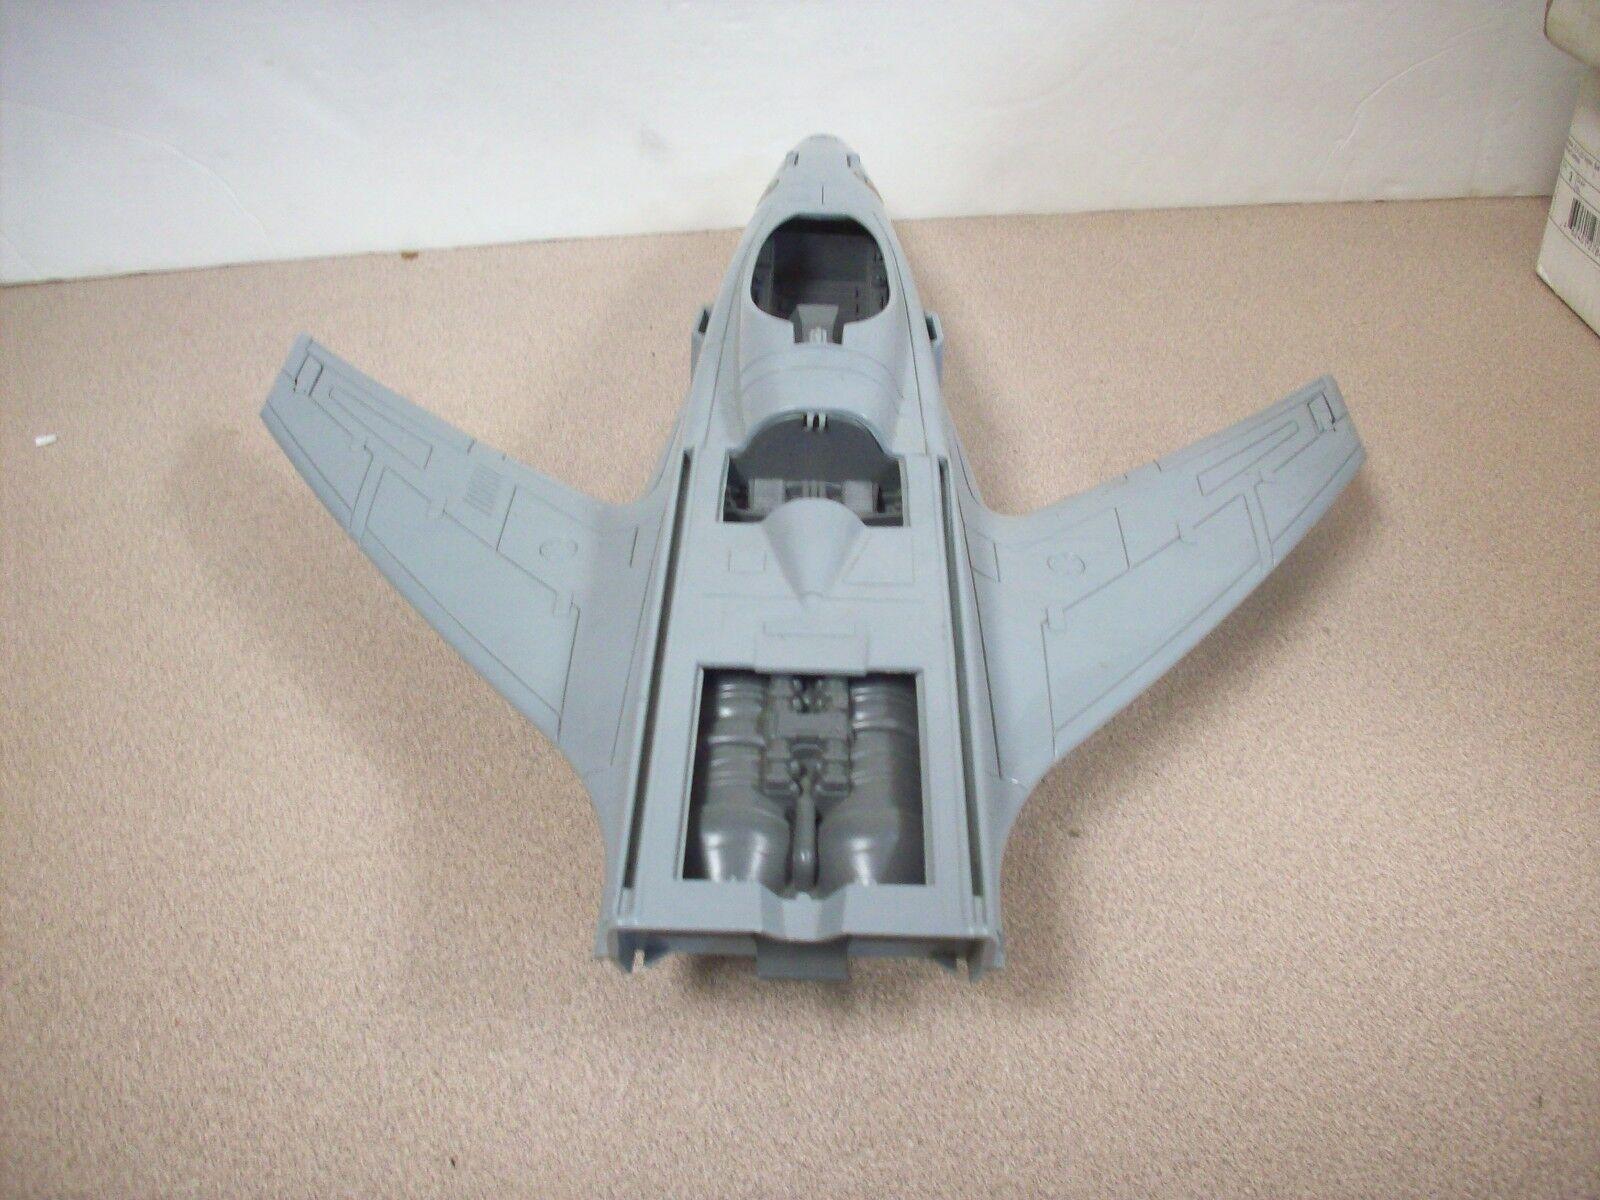 annata 1986 1986 1986 hasbro g.i. joe conquista jet. 69c15e